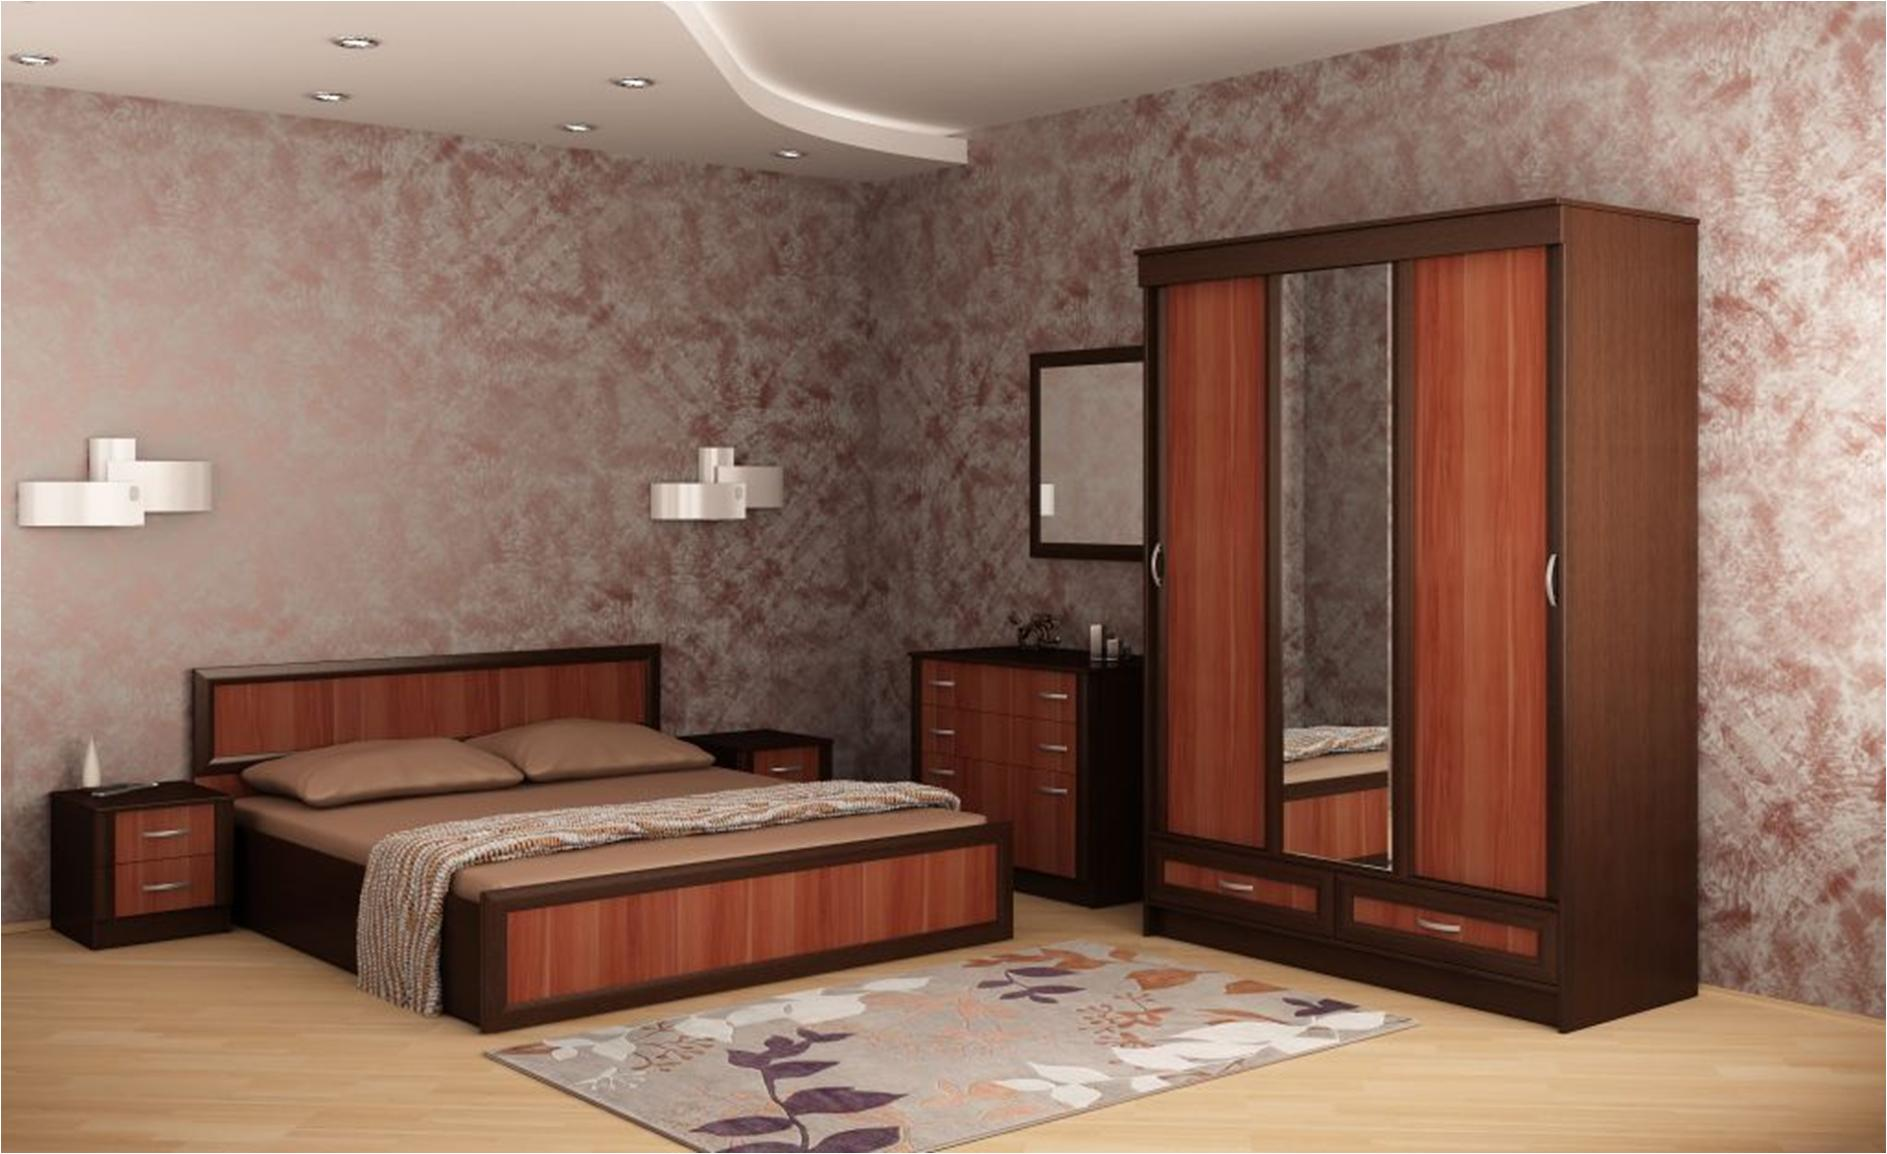 Спальня Валерия-11 Mebelus